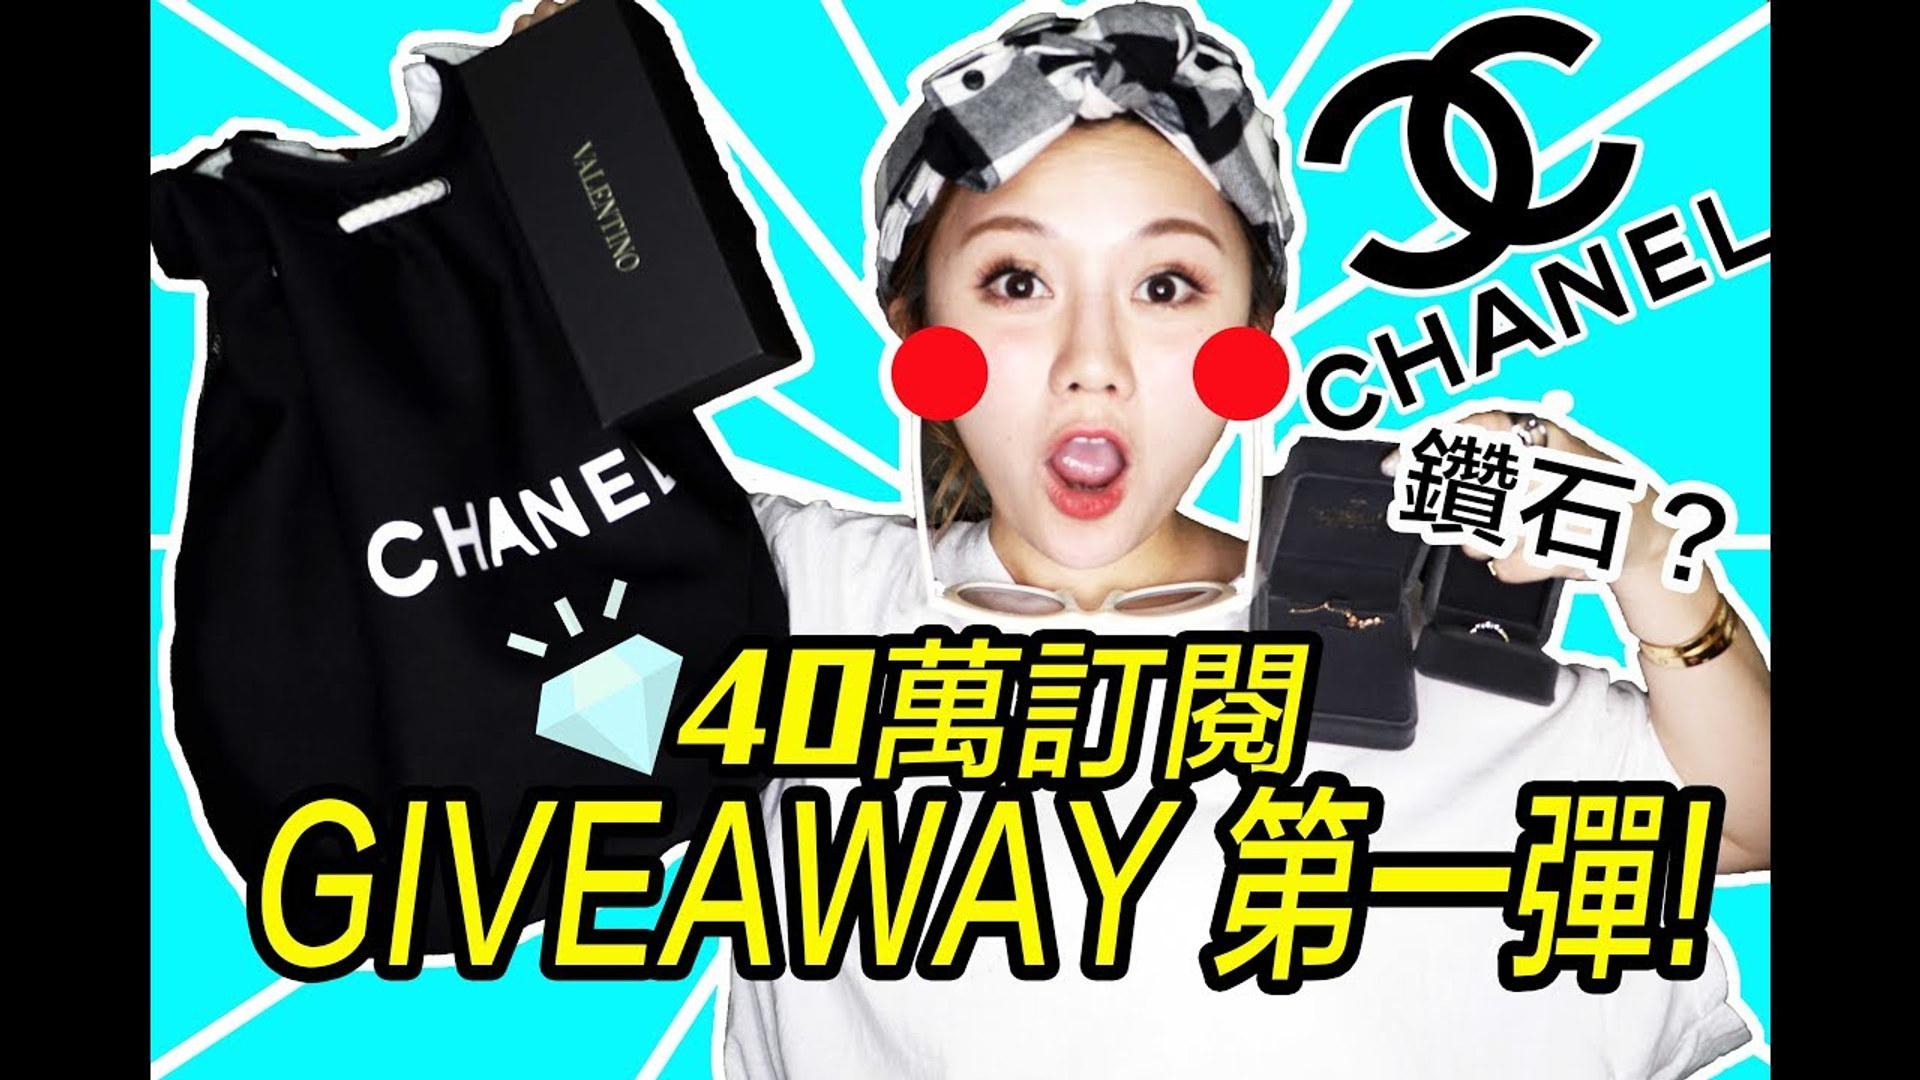 Hana Tam ♥ 過萬元!奢華版40萬訂閱GIVEAWAY【第一彈】Chanel包/Valentino眼鏡/寶石+鑽石